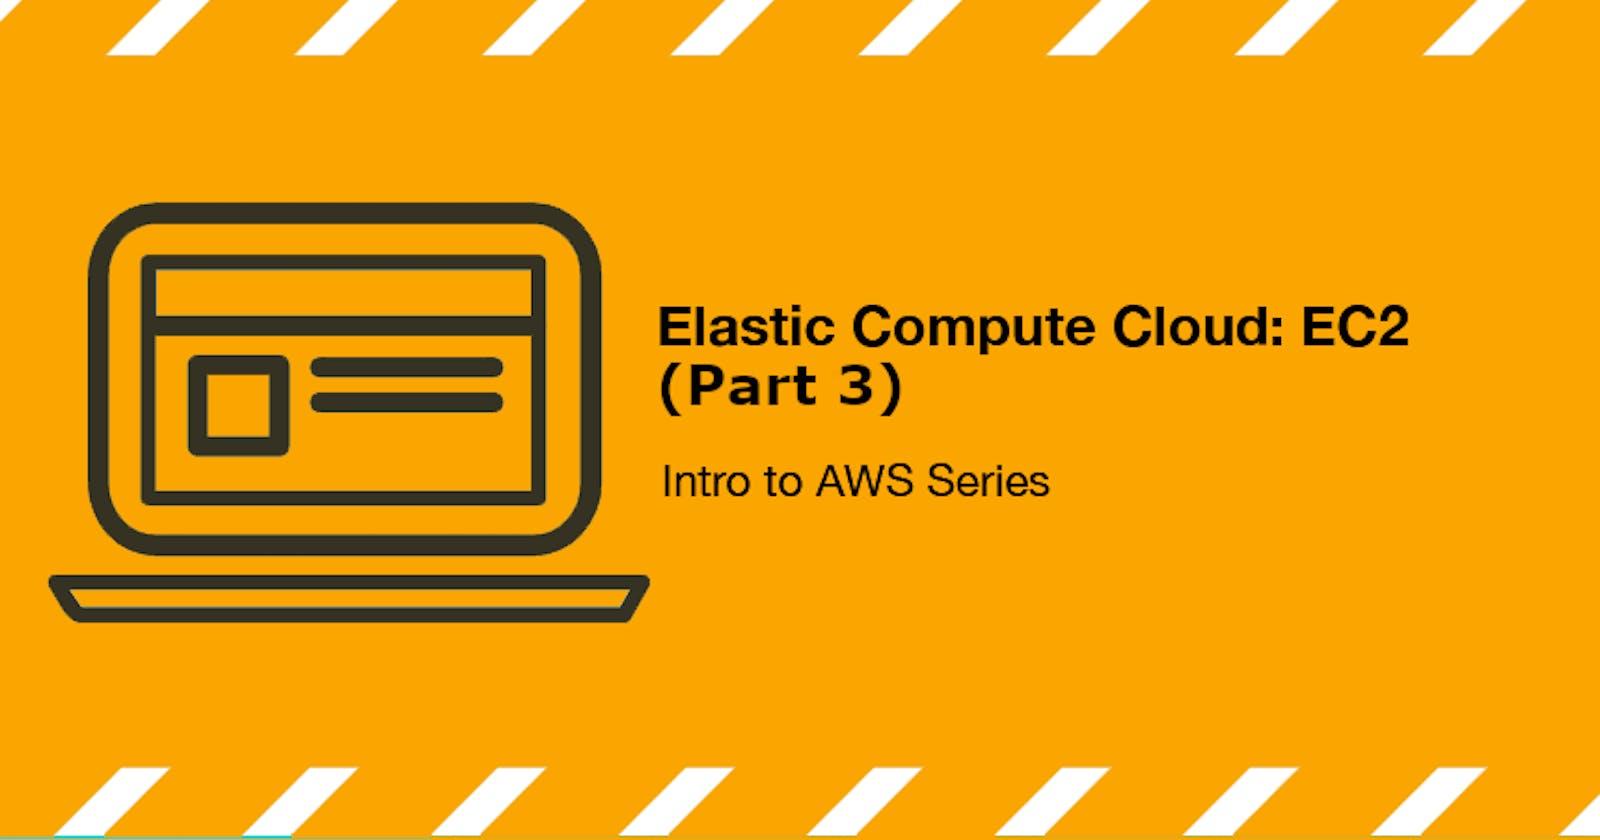 Elastic Compute Cloud: EC2 (Intro to AWS Series) Part 3